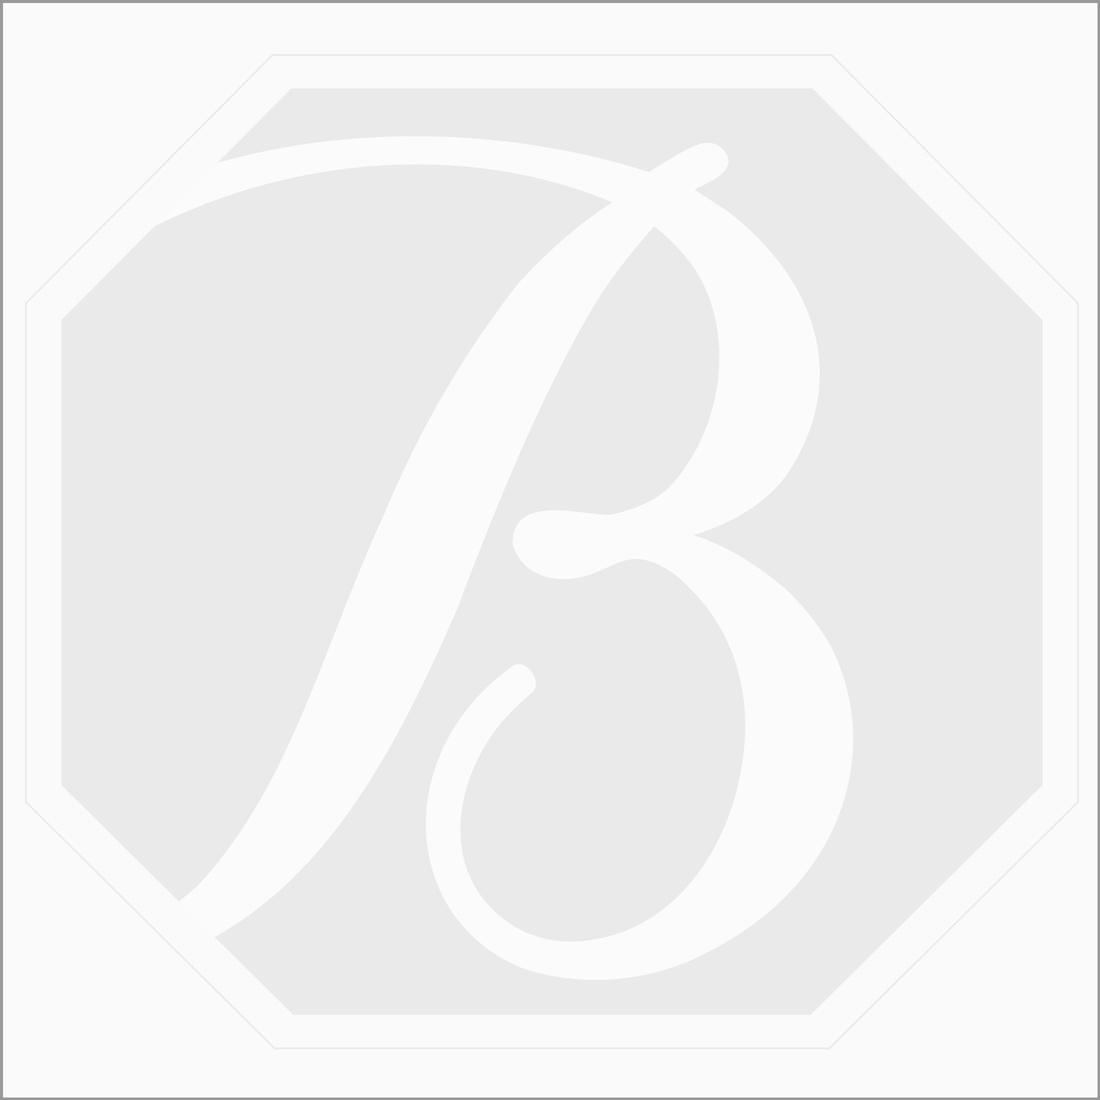 0.59 ct. Oval (G-VS1) White Rose Cut Diamond Photograph